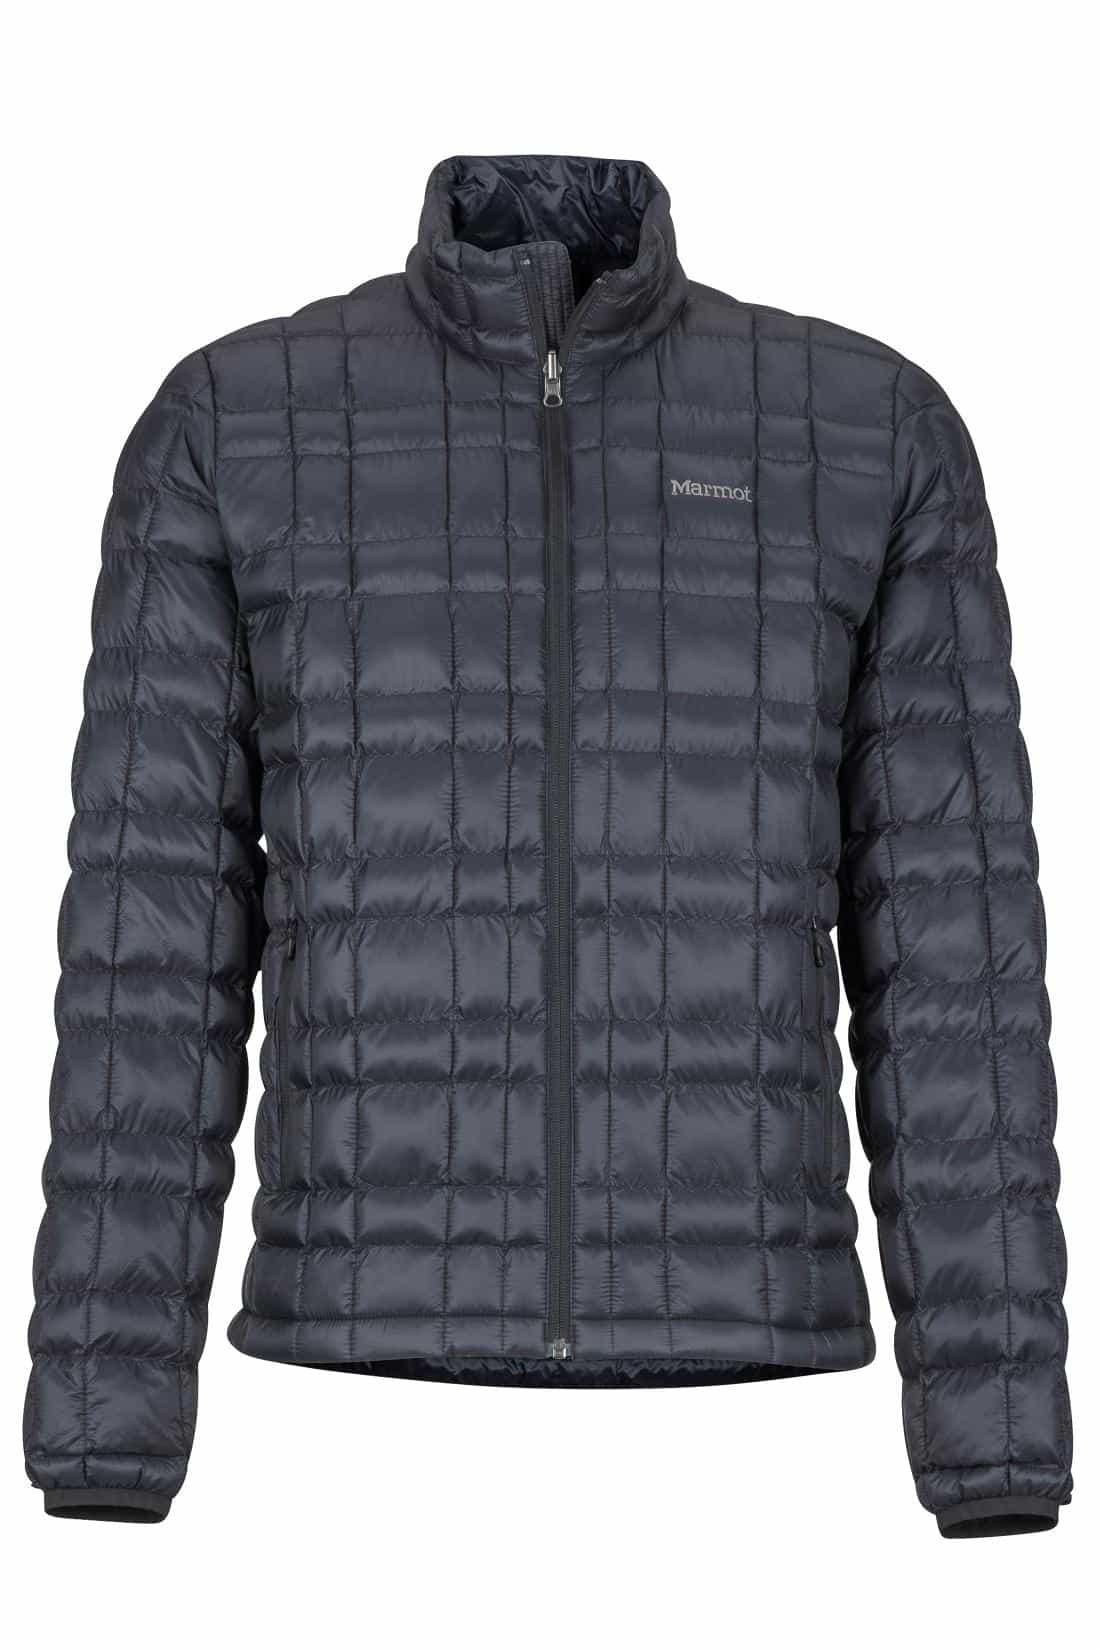 Marmot-Marmot Featherless Jacket - Men's